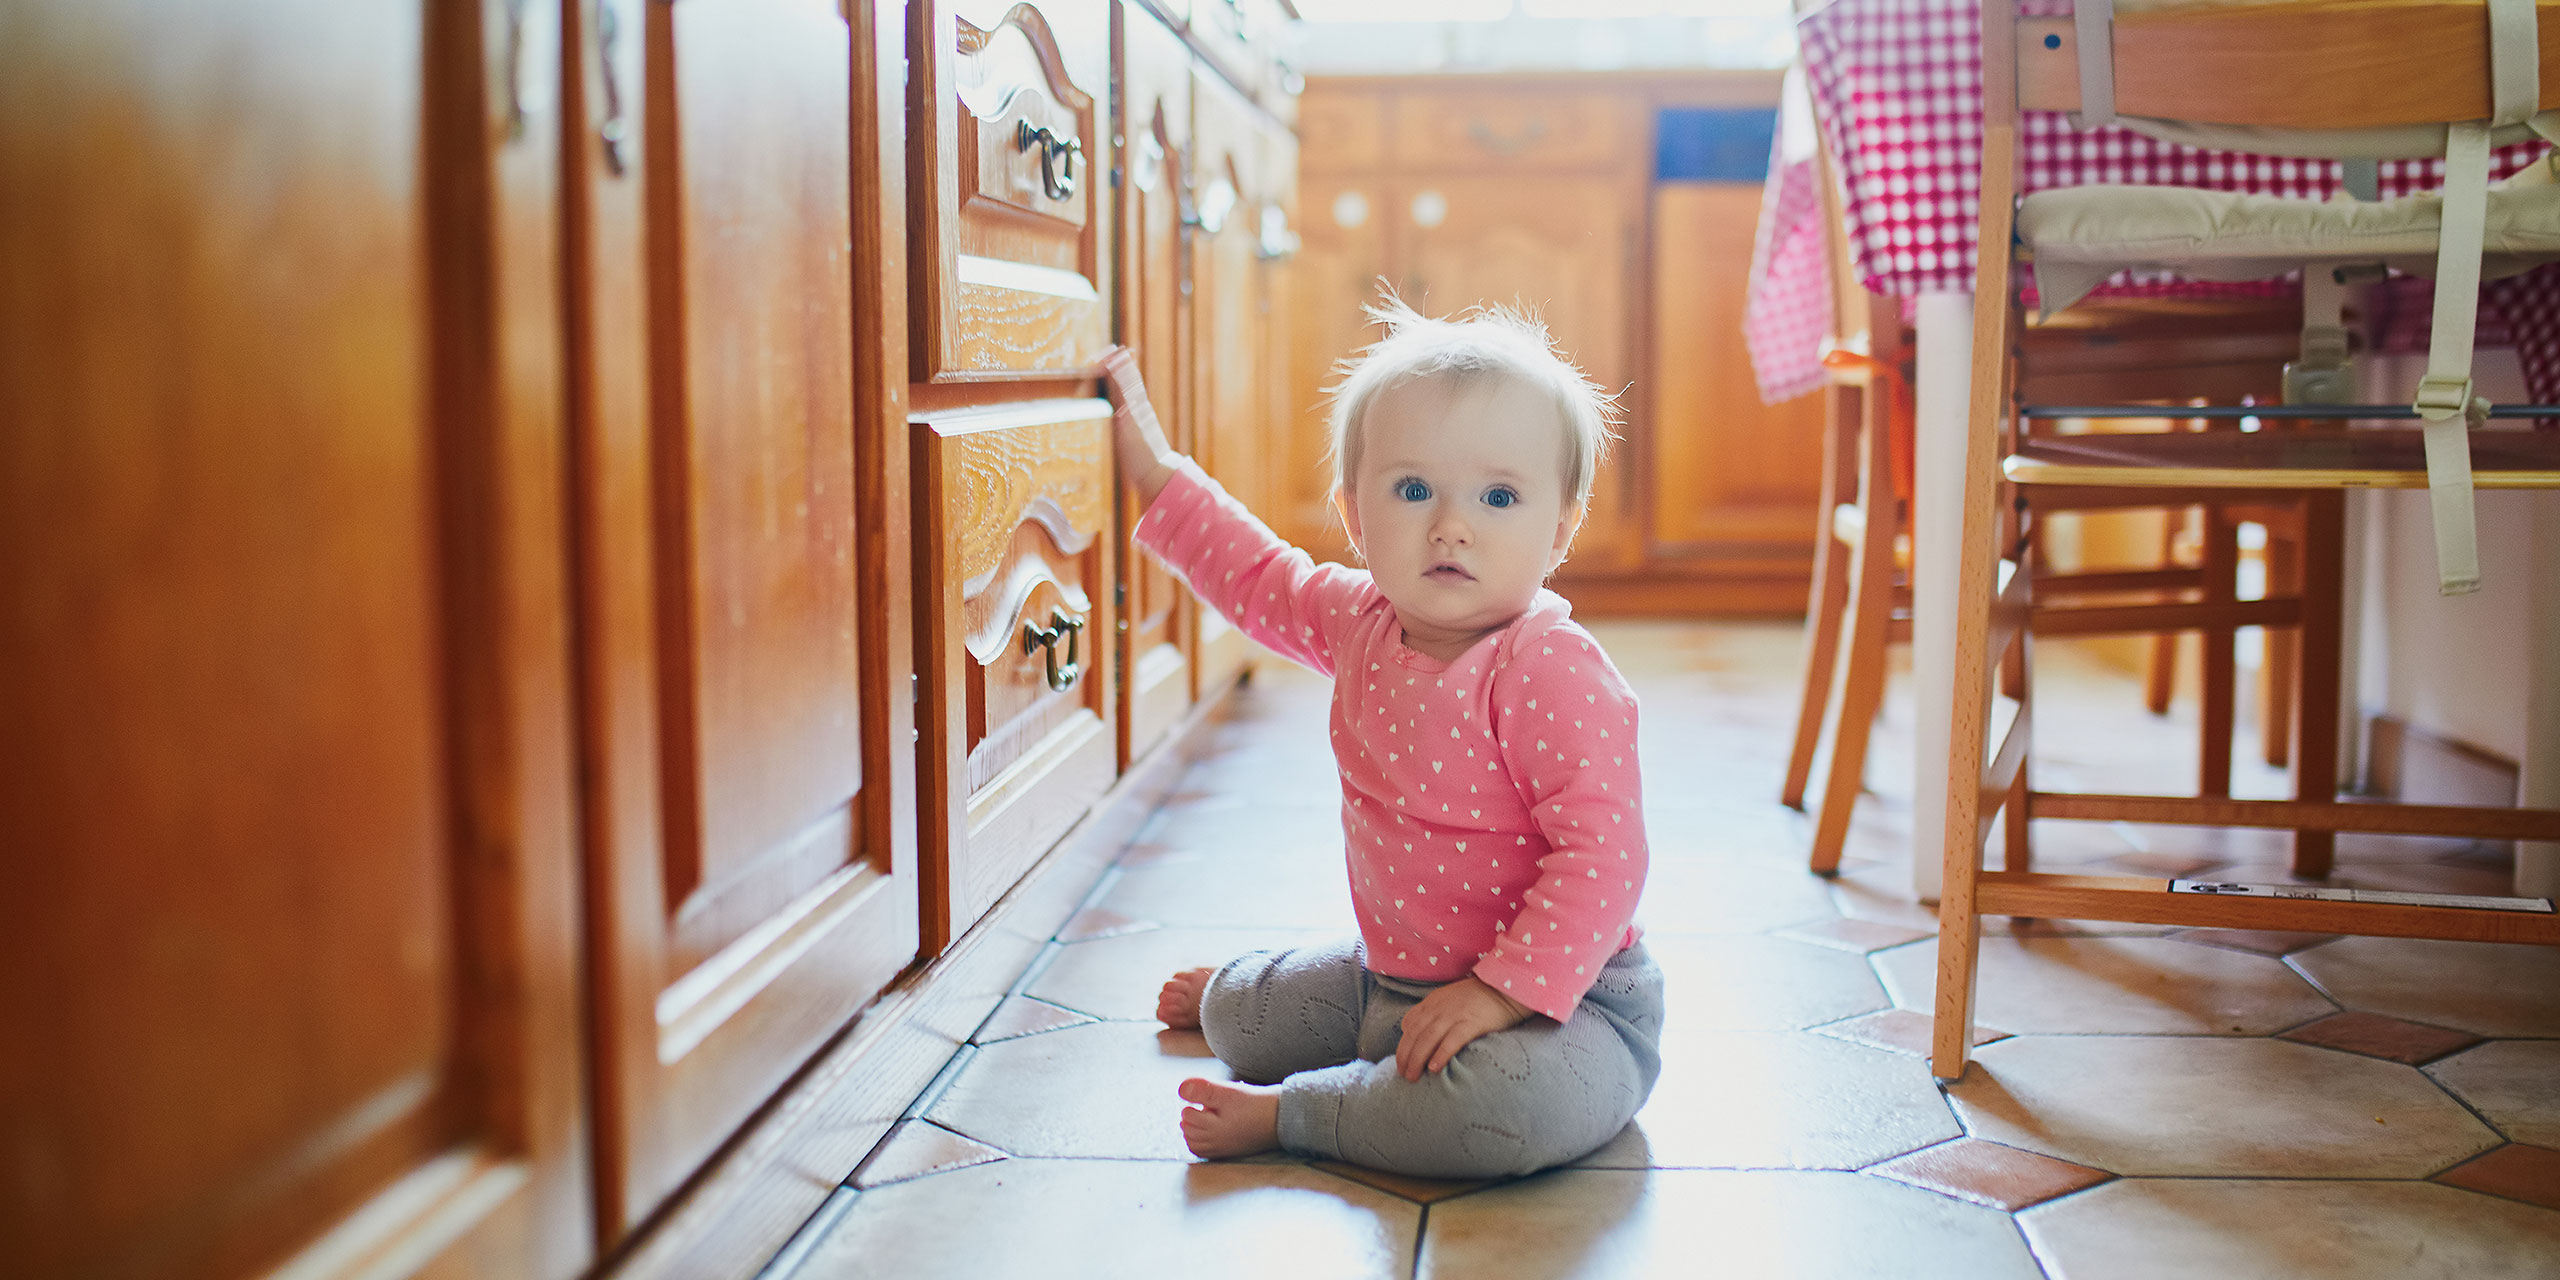 Toddler on Floor in Kitchen; Courtesy of Ekaterina Pokrovsky/Shutterstock.com